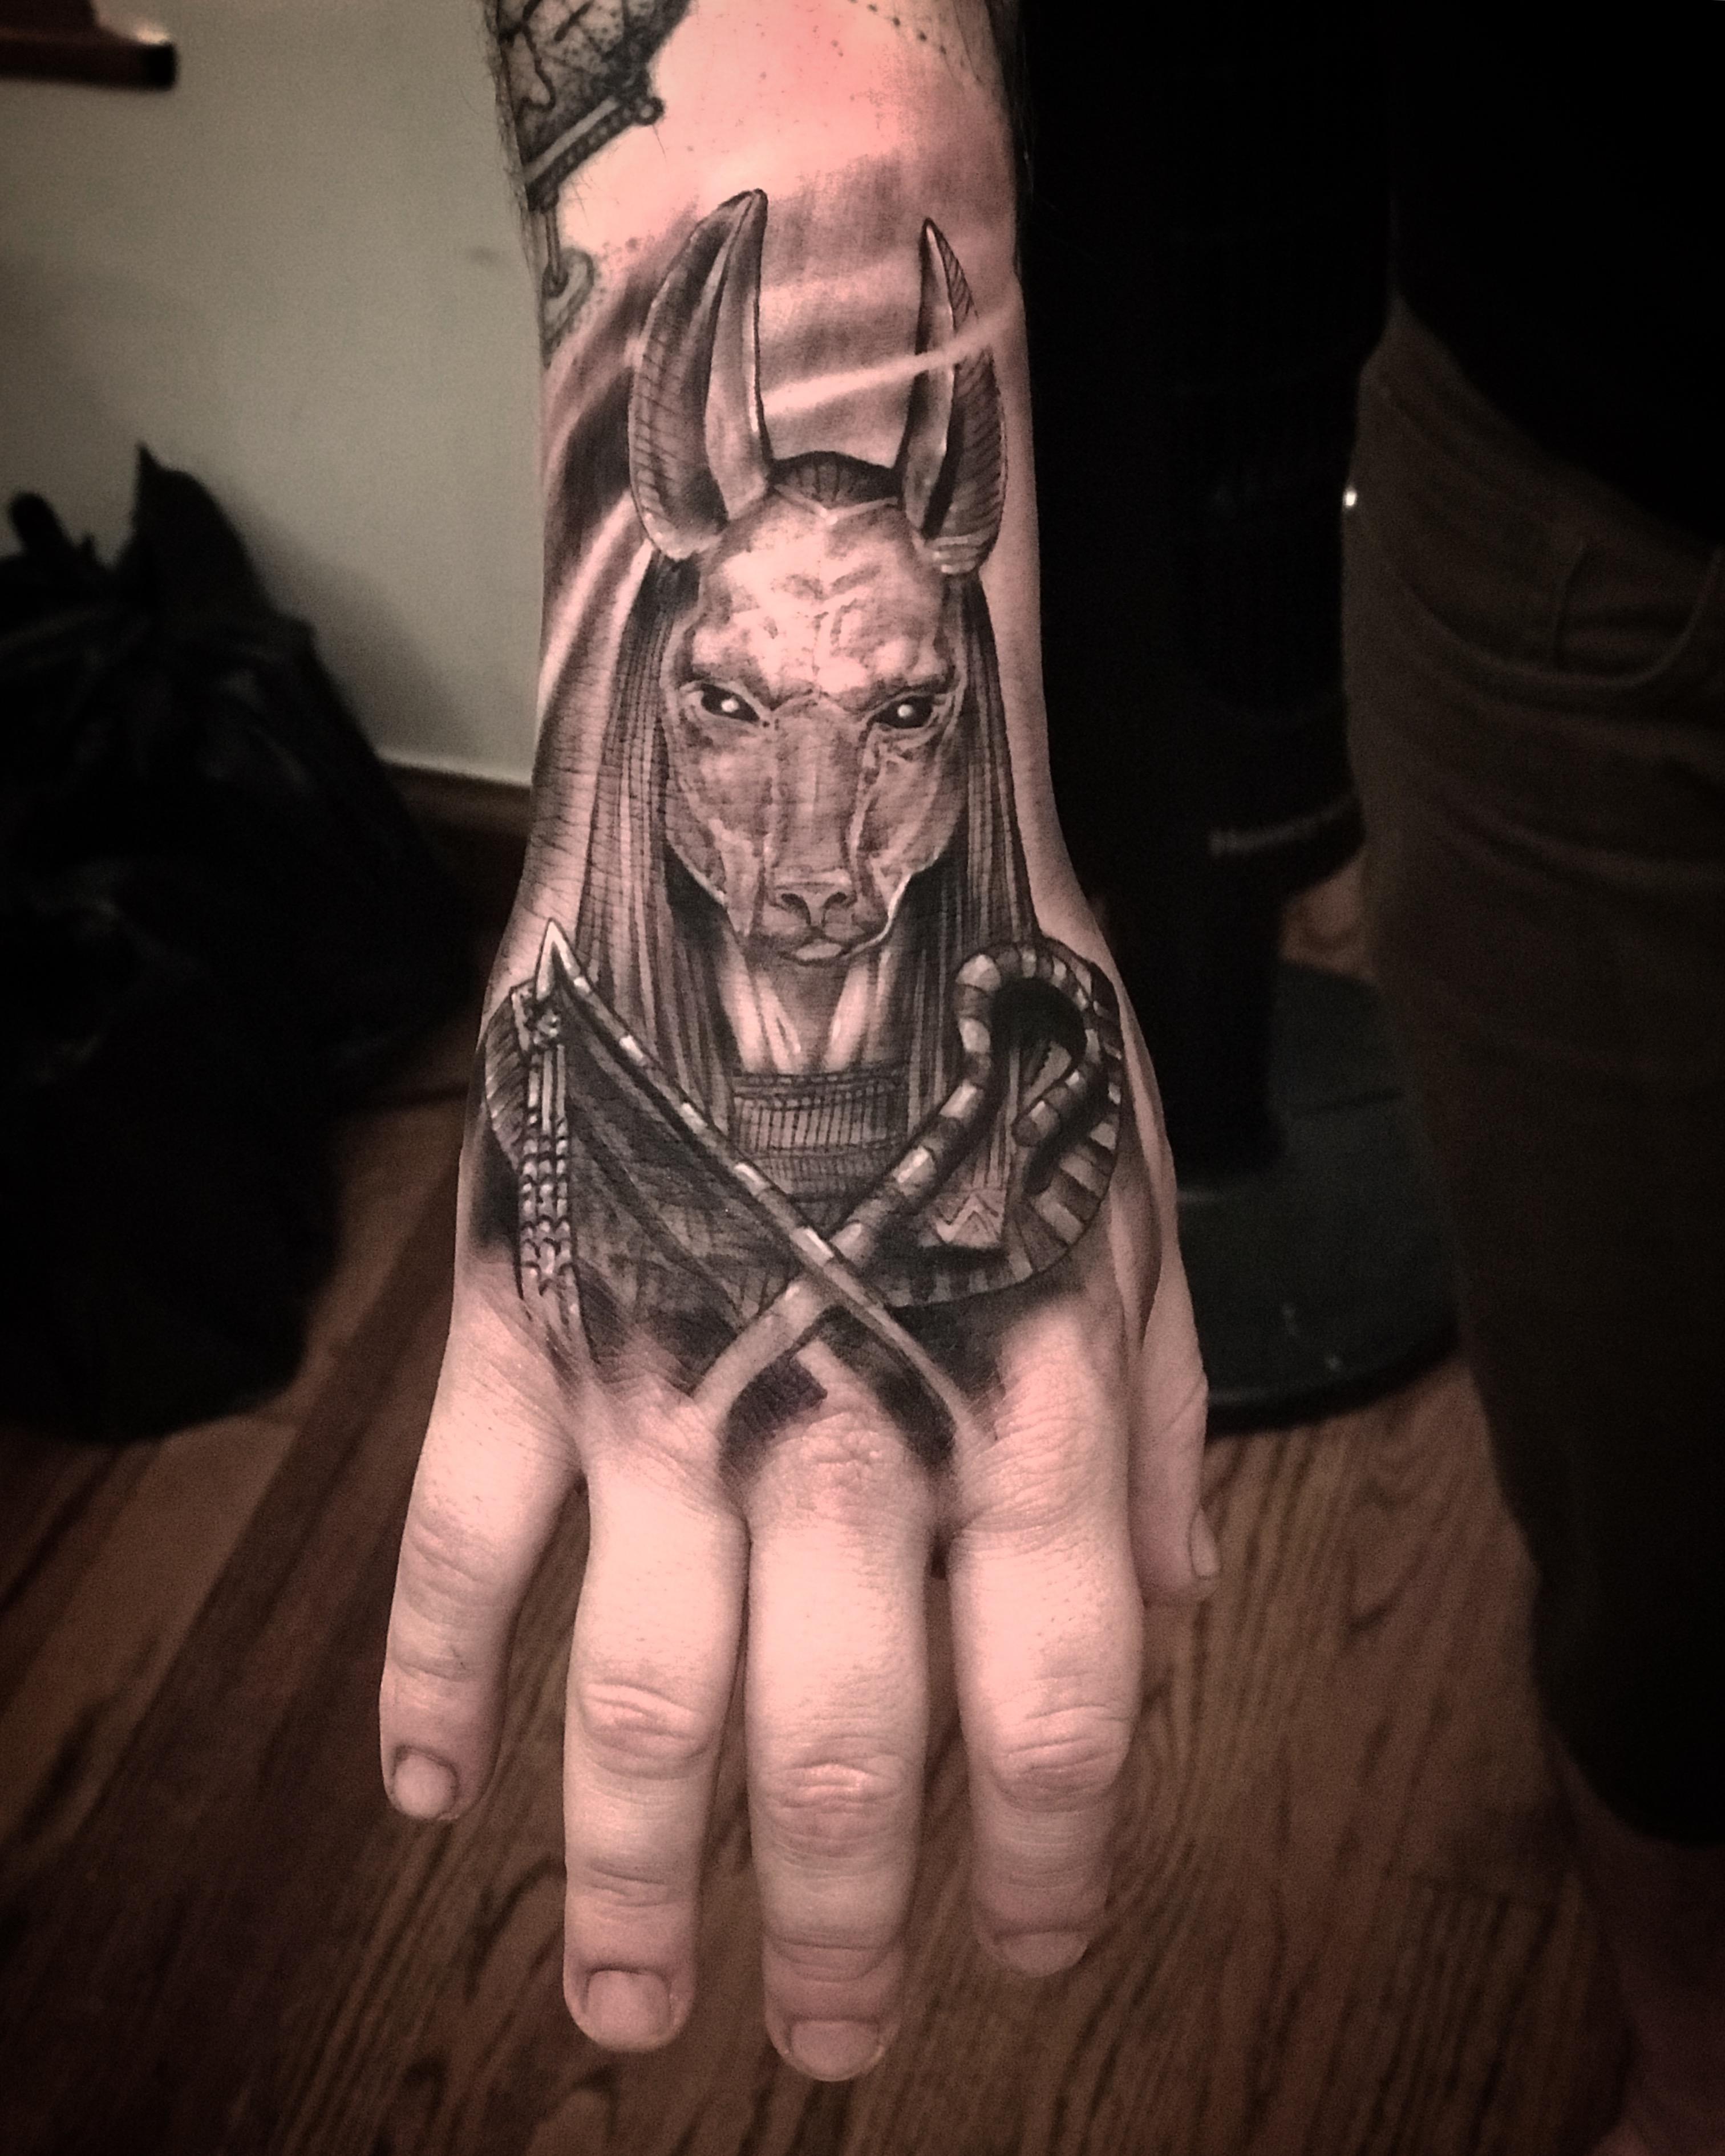 Anubis hand tattoo